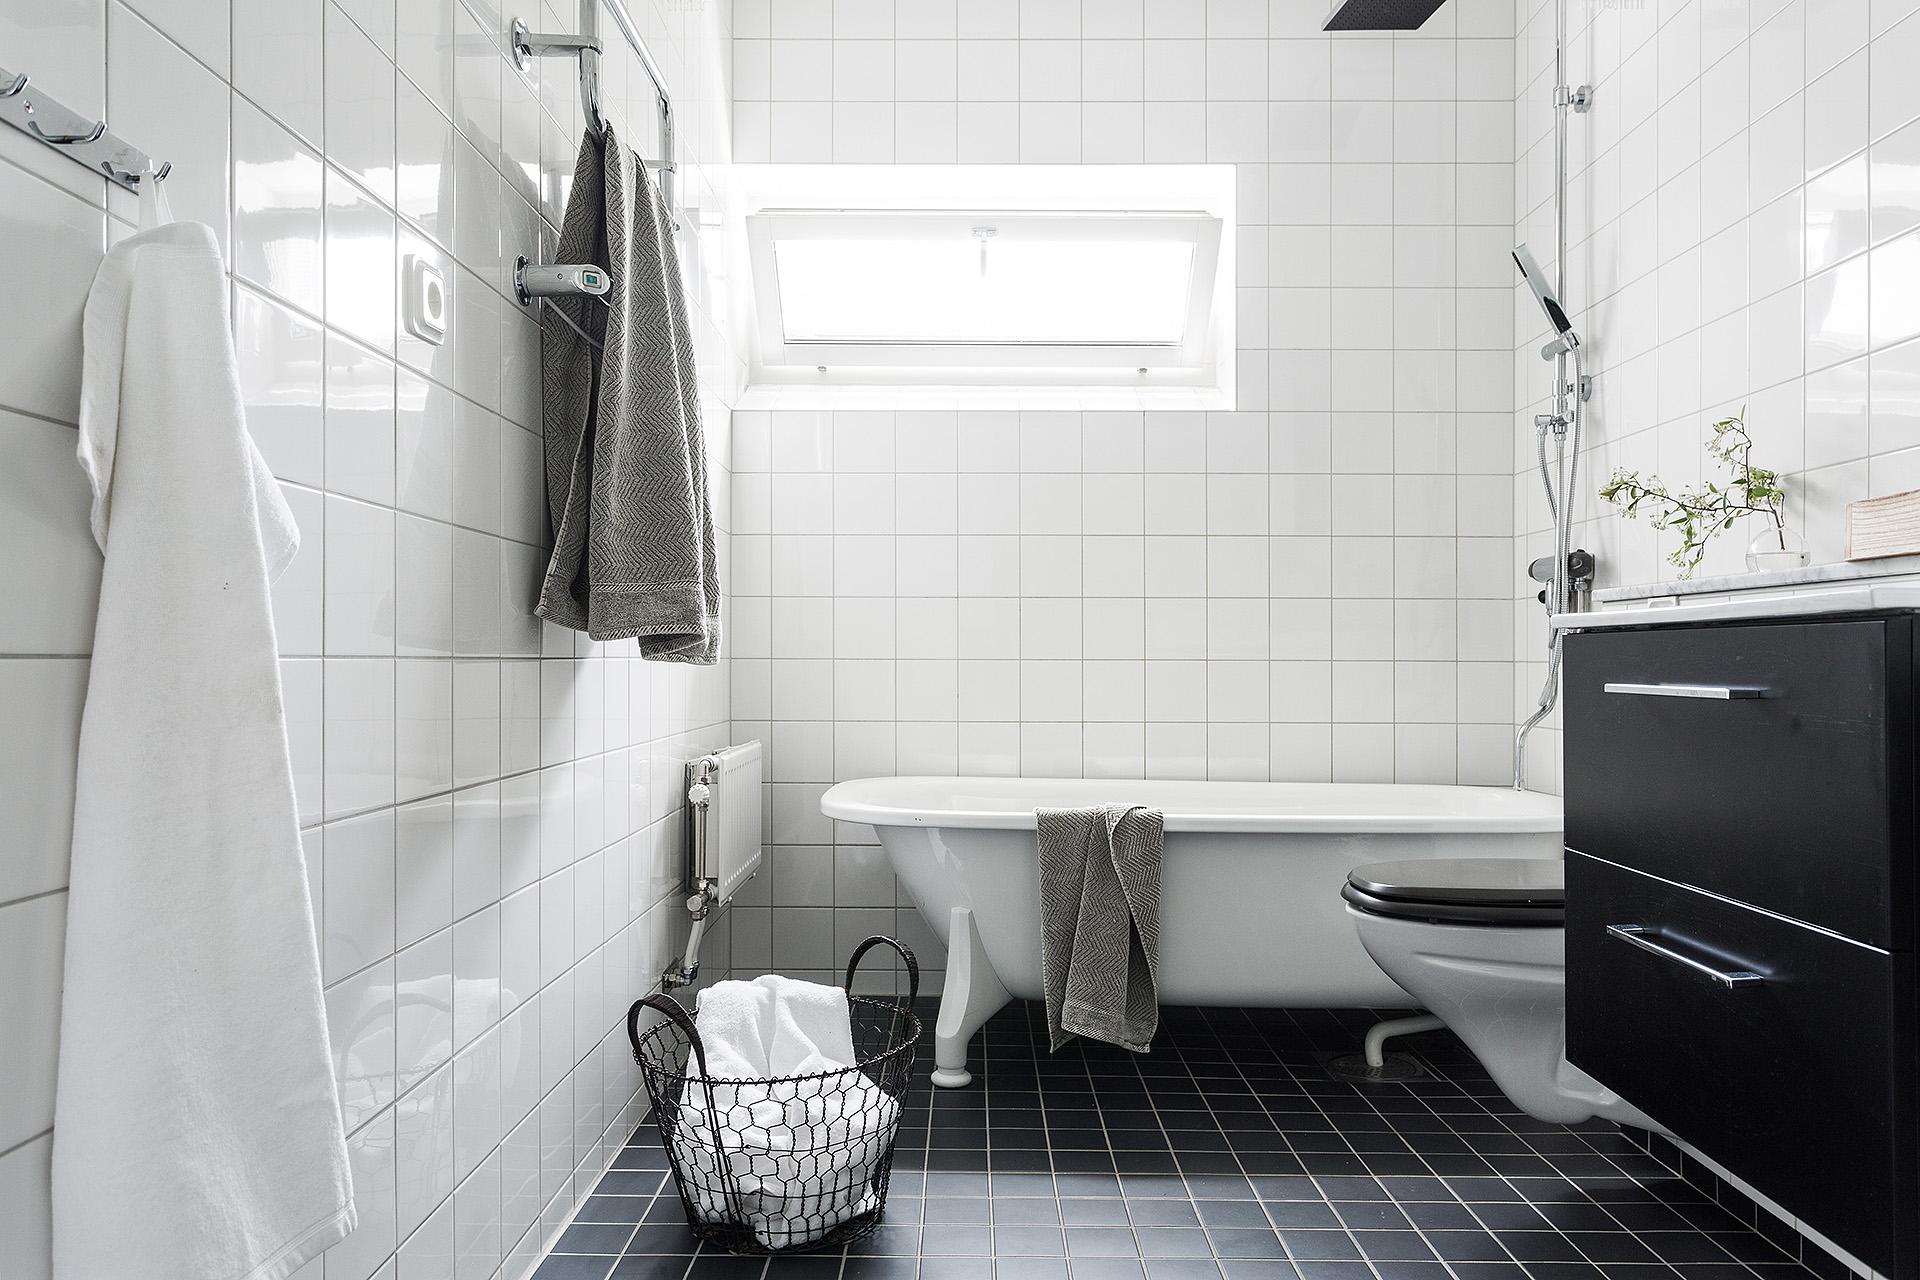 simpele ikea badkamer badkamers voorbeelden. Black Bedroom Furniture Sets. Home Design Ideas